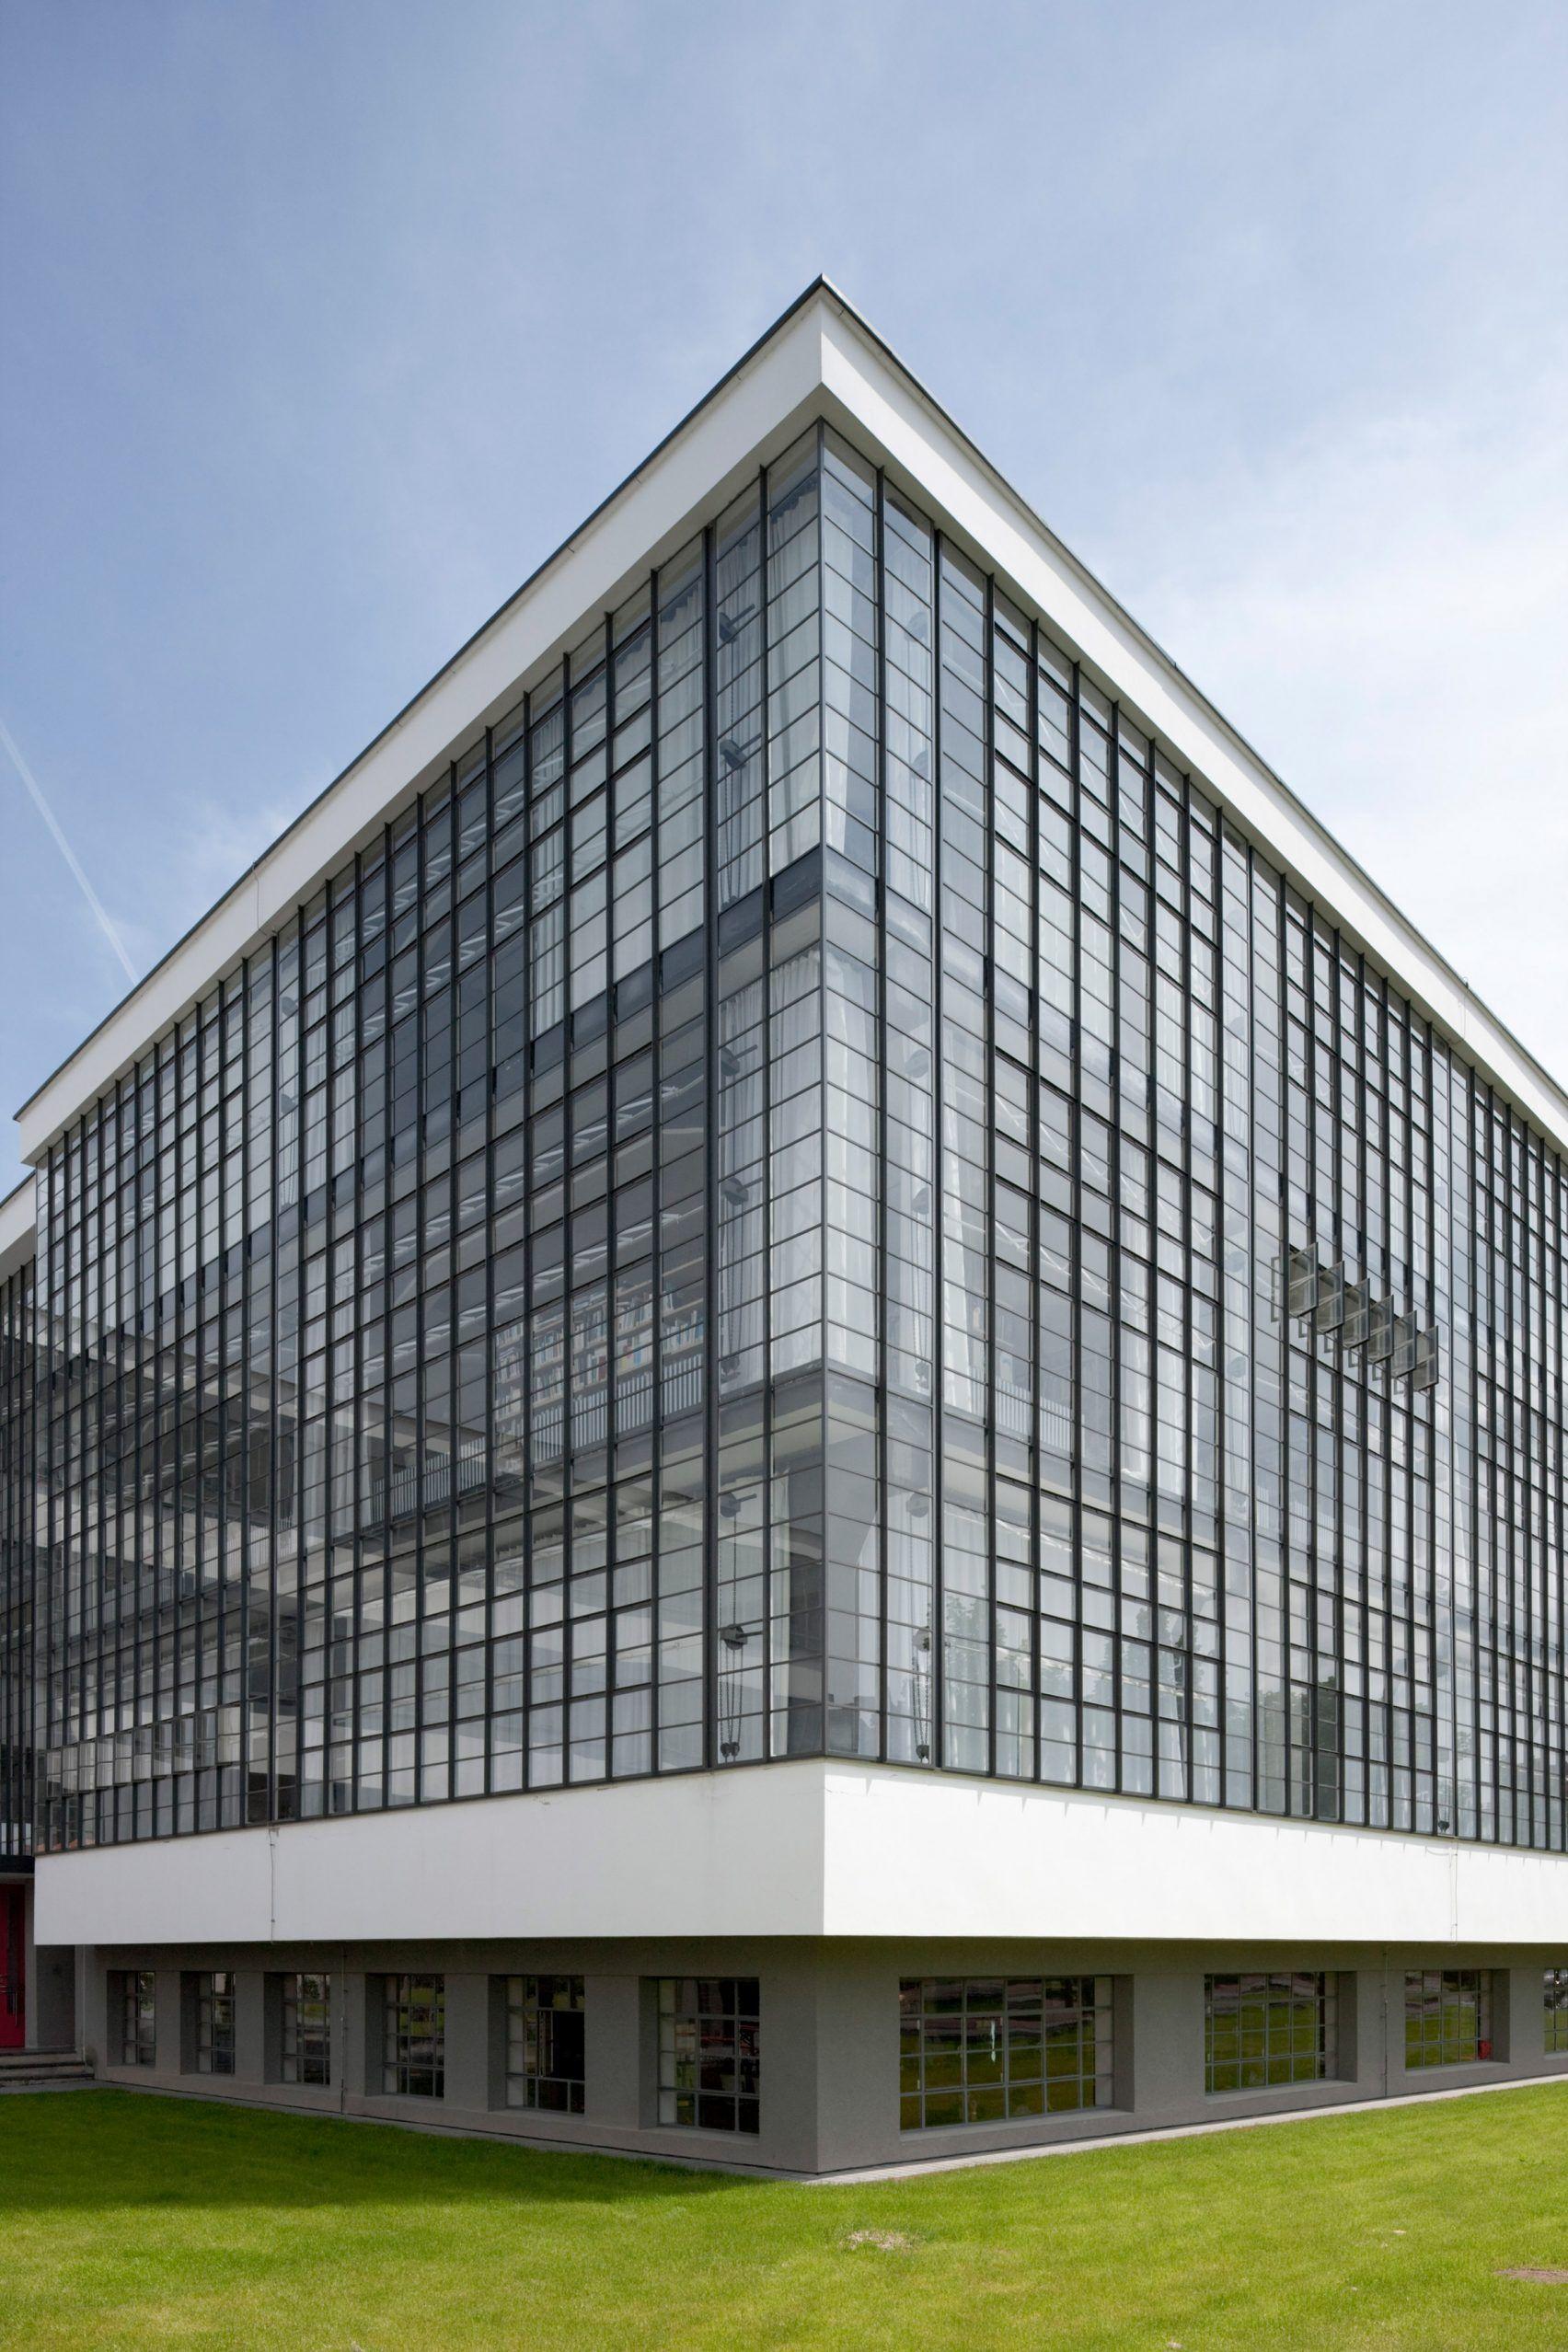 Bauhaus School Dessau By Walter Gropius With Images Bauhaus